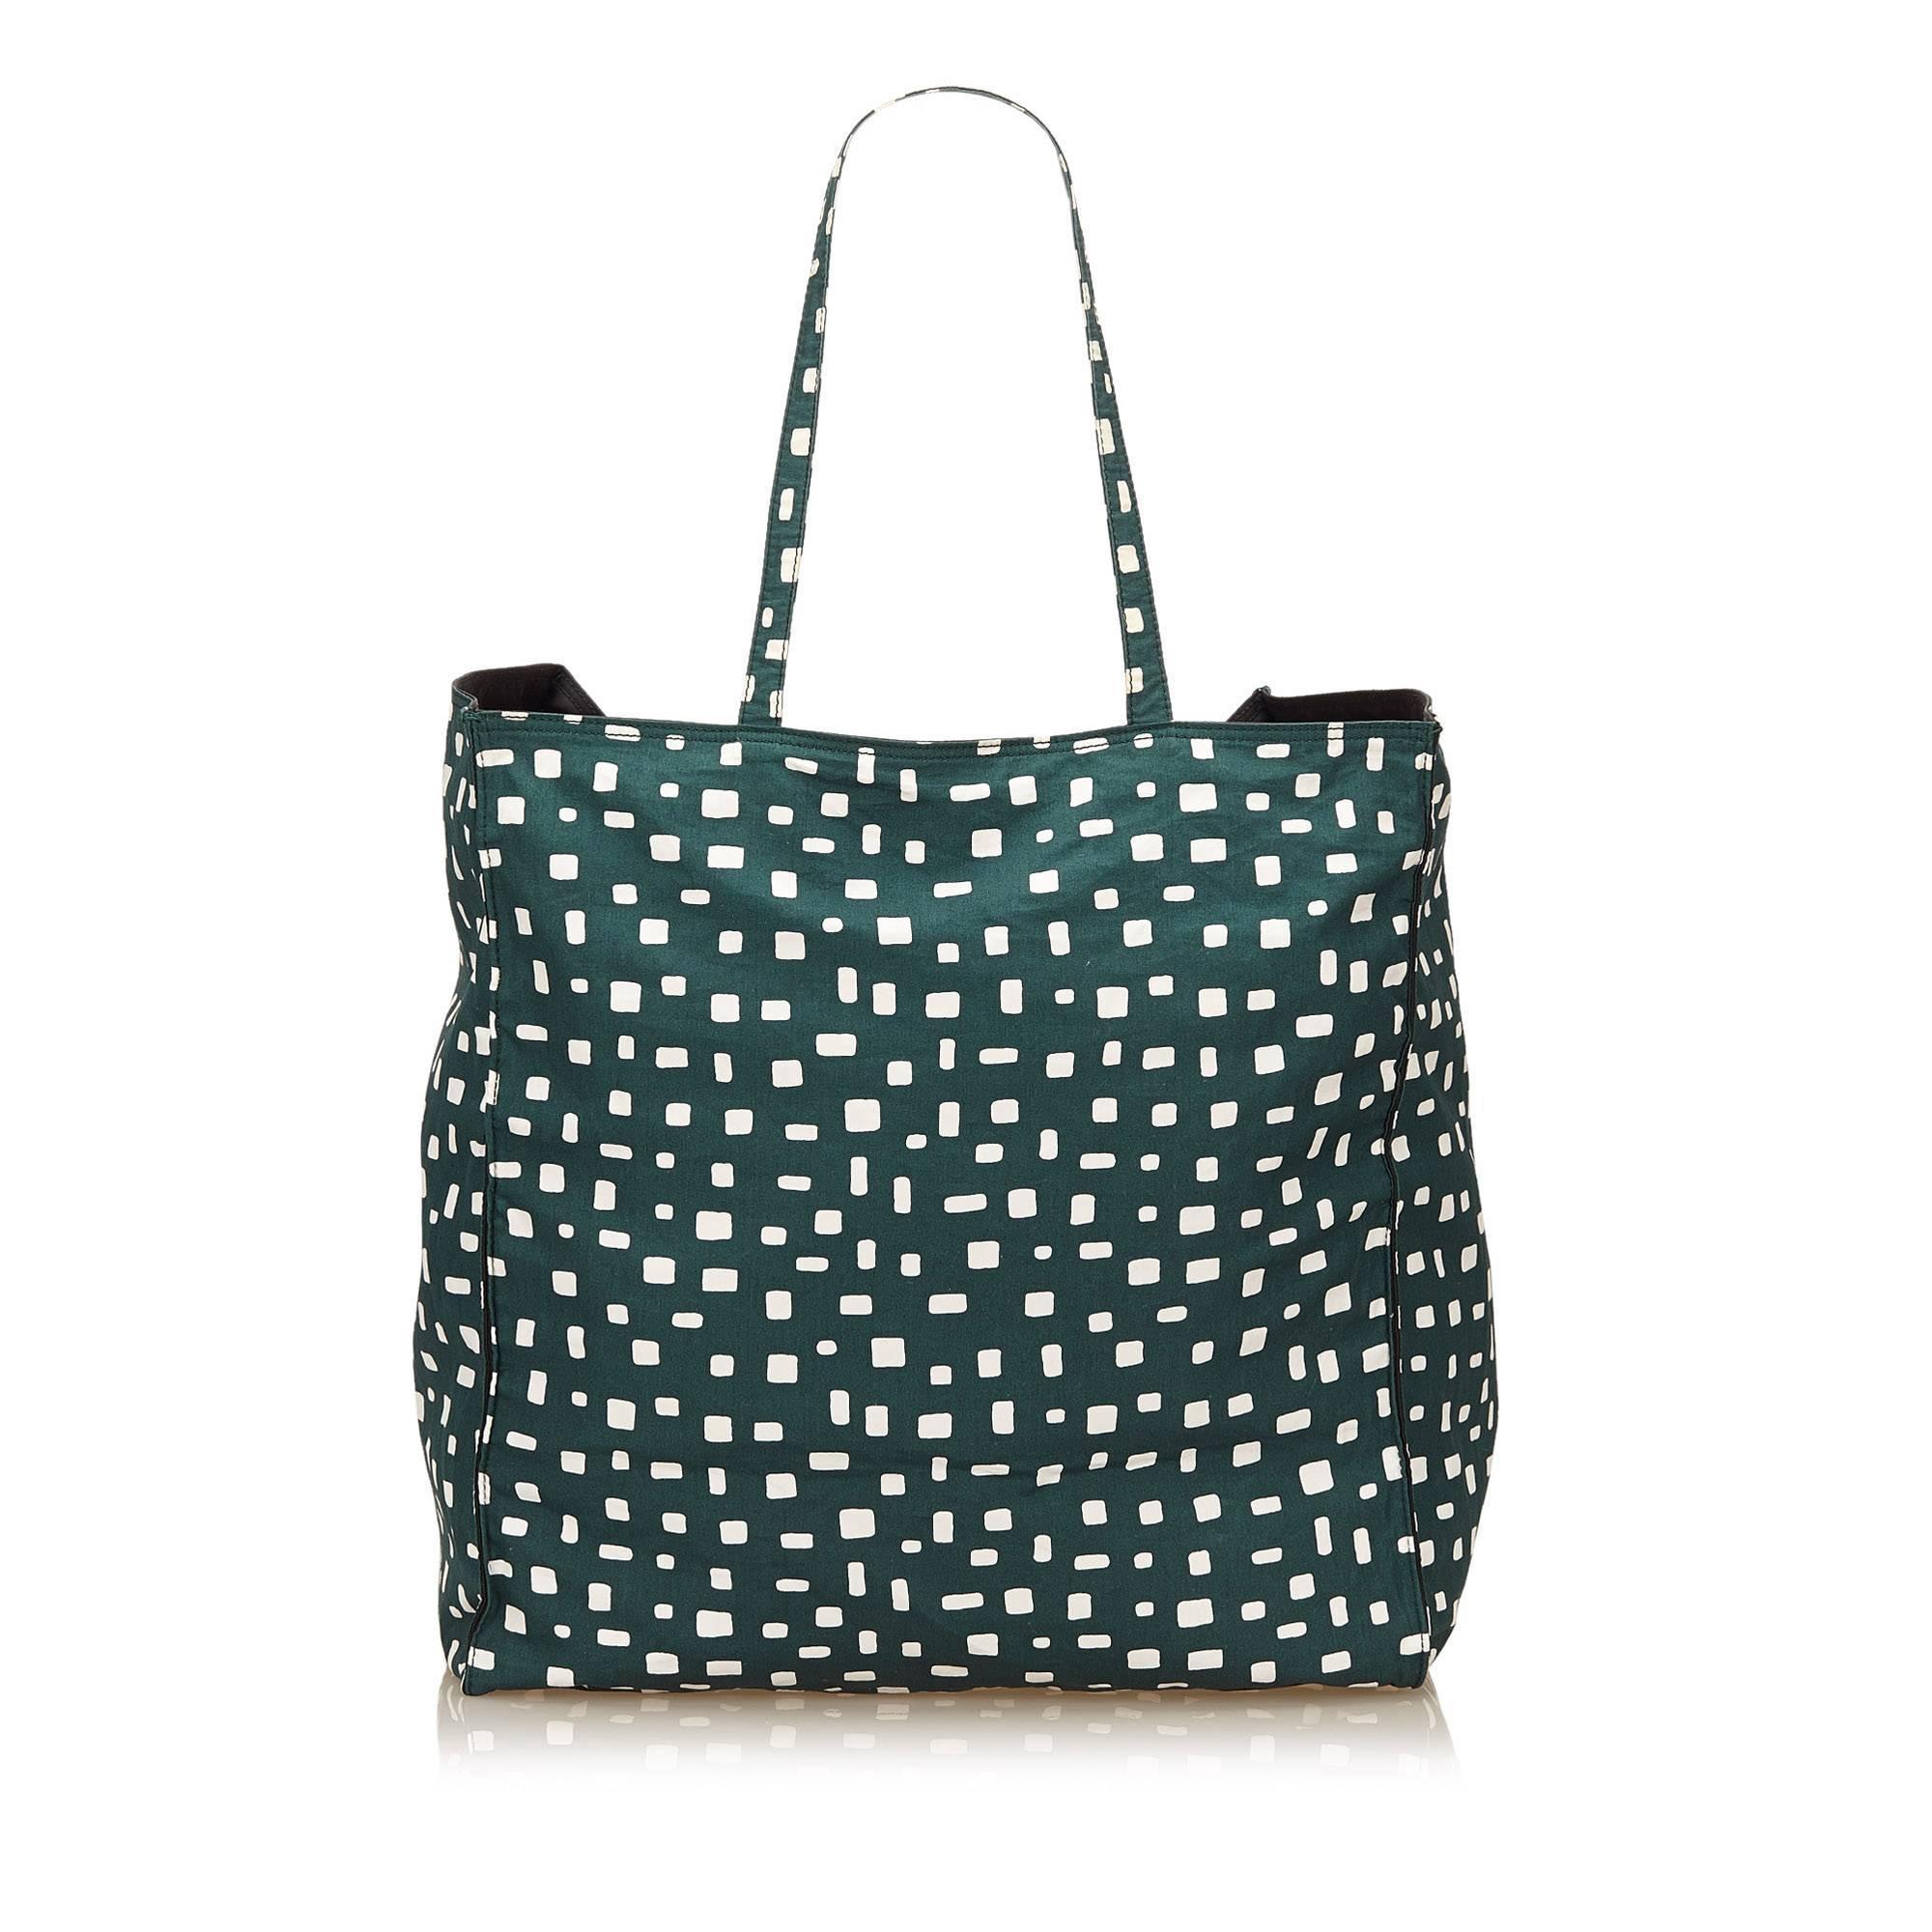 6284cdcc1ff8 ... usa prada dark green and white pattern nylon tote bag tkxj0vc 11d82  a8623